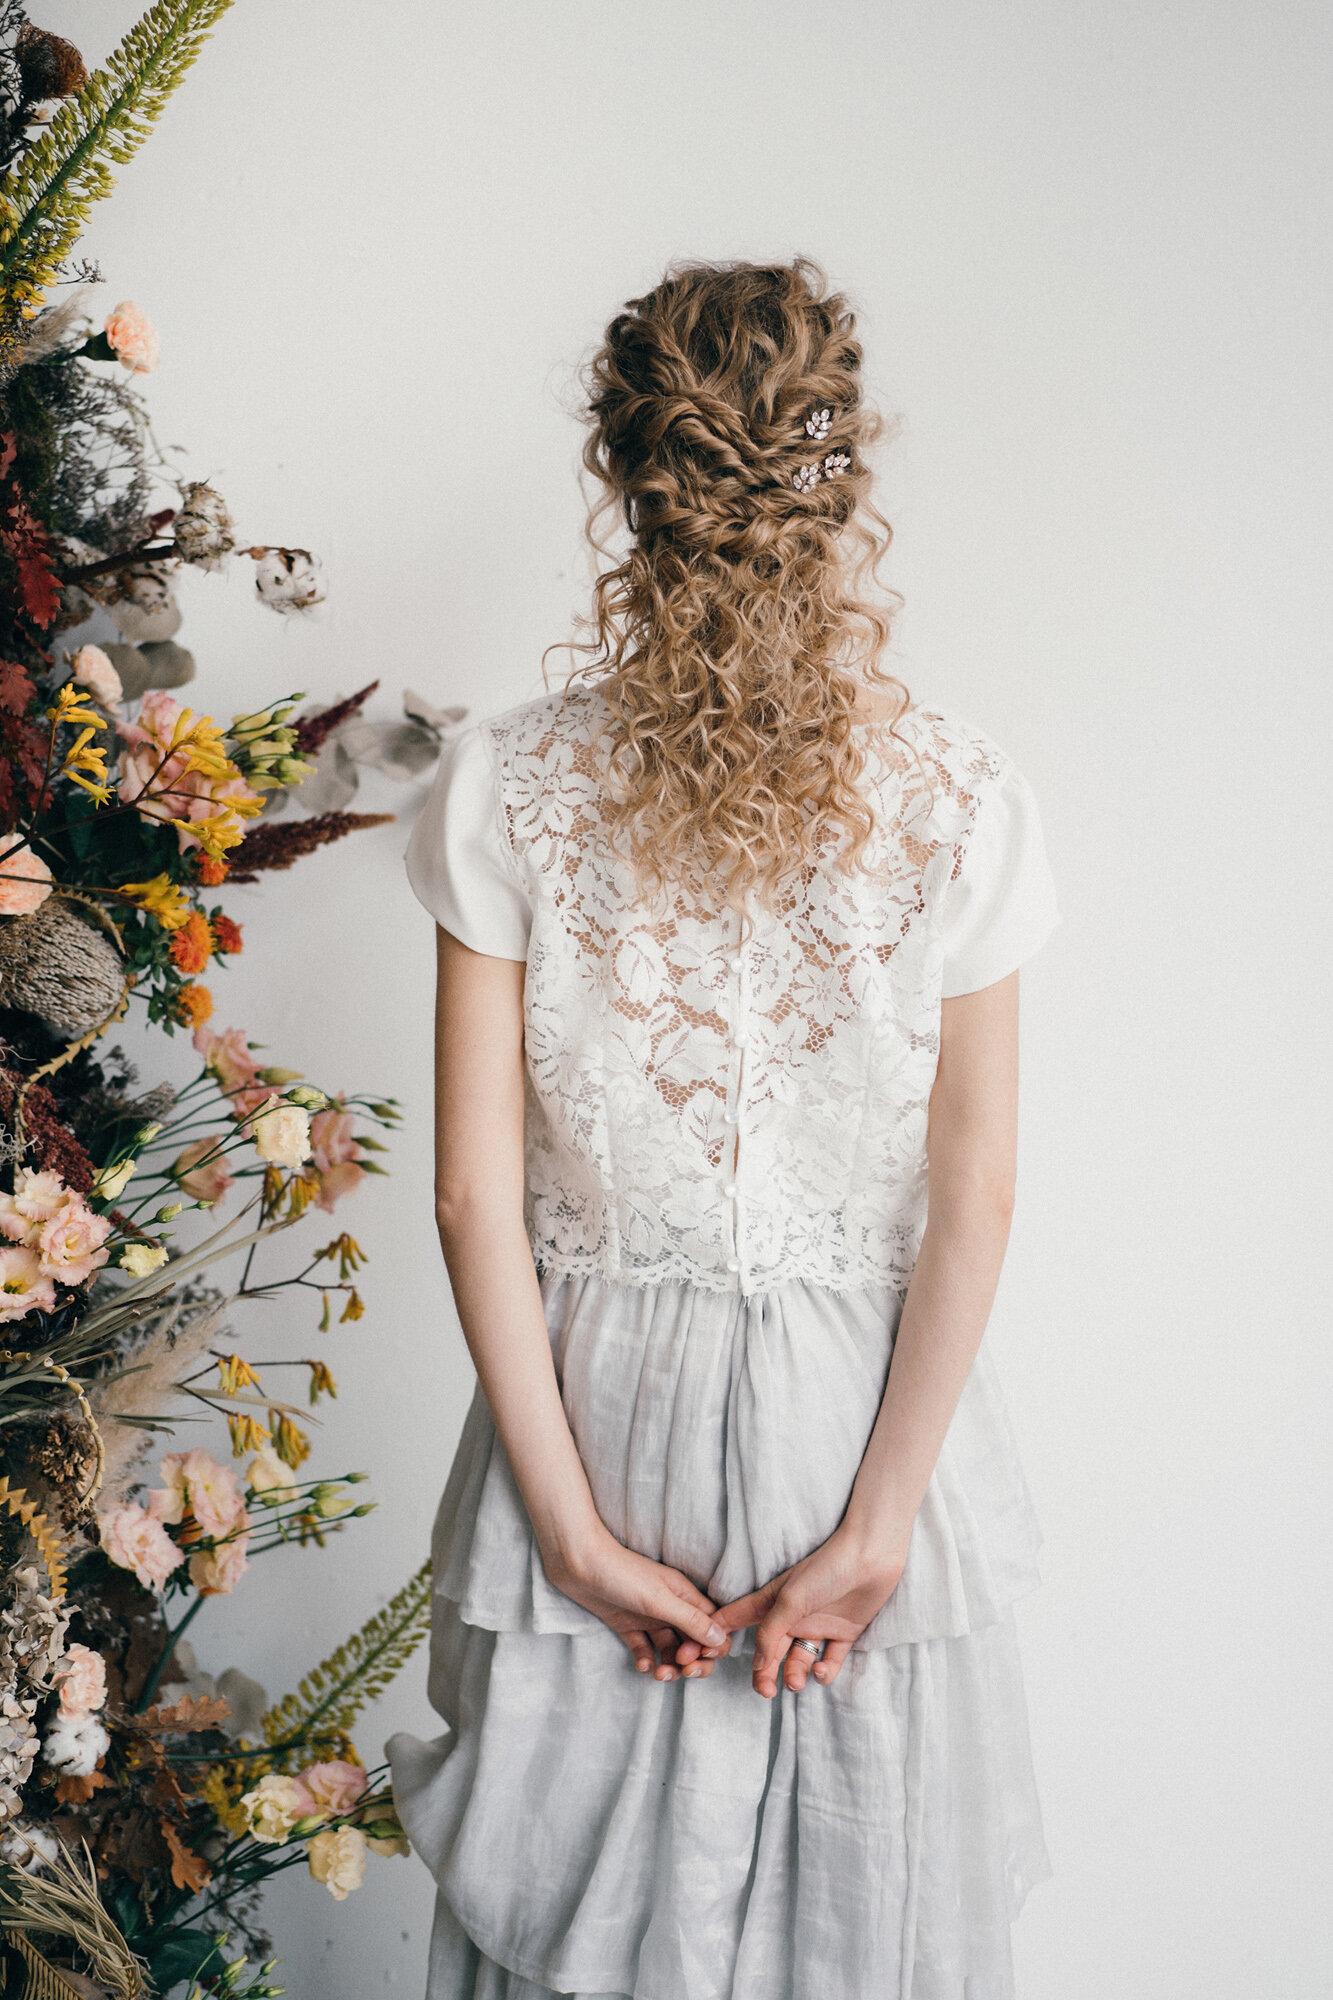 Debbie-Carlisle-Bridal-Accessories-Kate-Beaumont-Wedding-Gowns-Sheffield-Yorkshire-UK-31.jpg